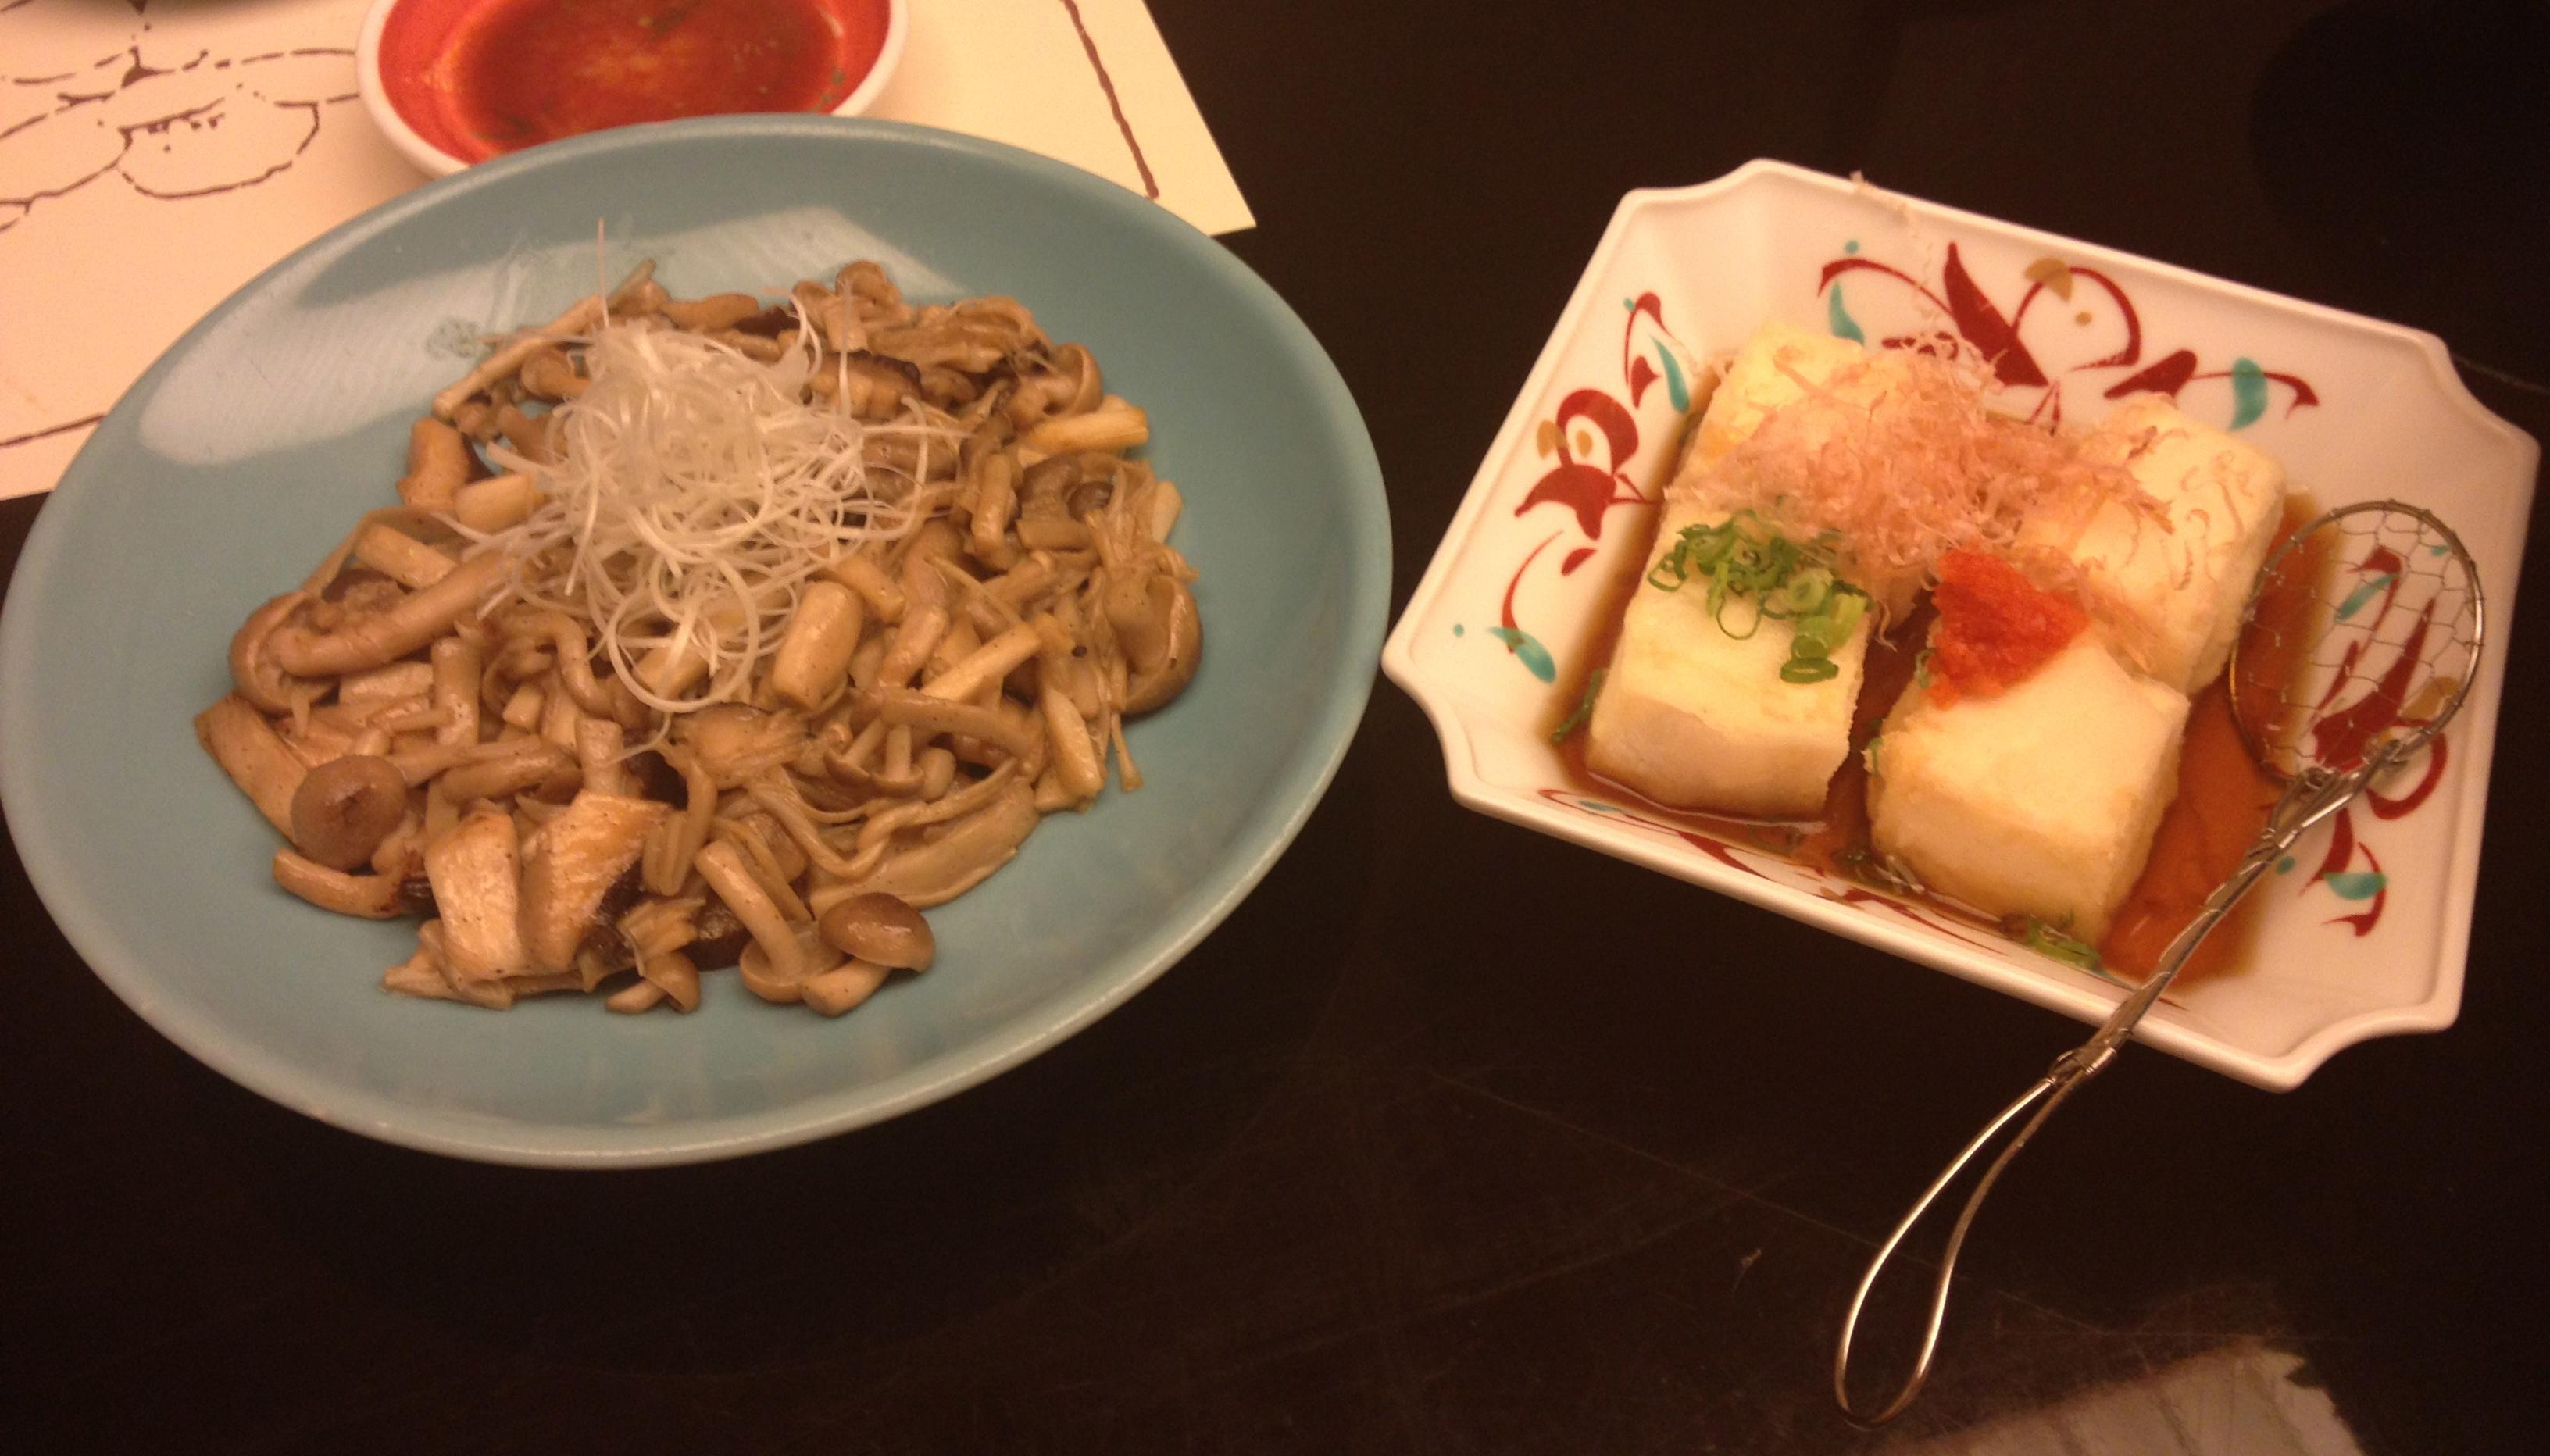 Simmering mushrooms and deep fried tofu